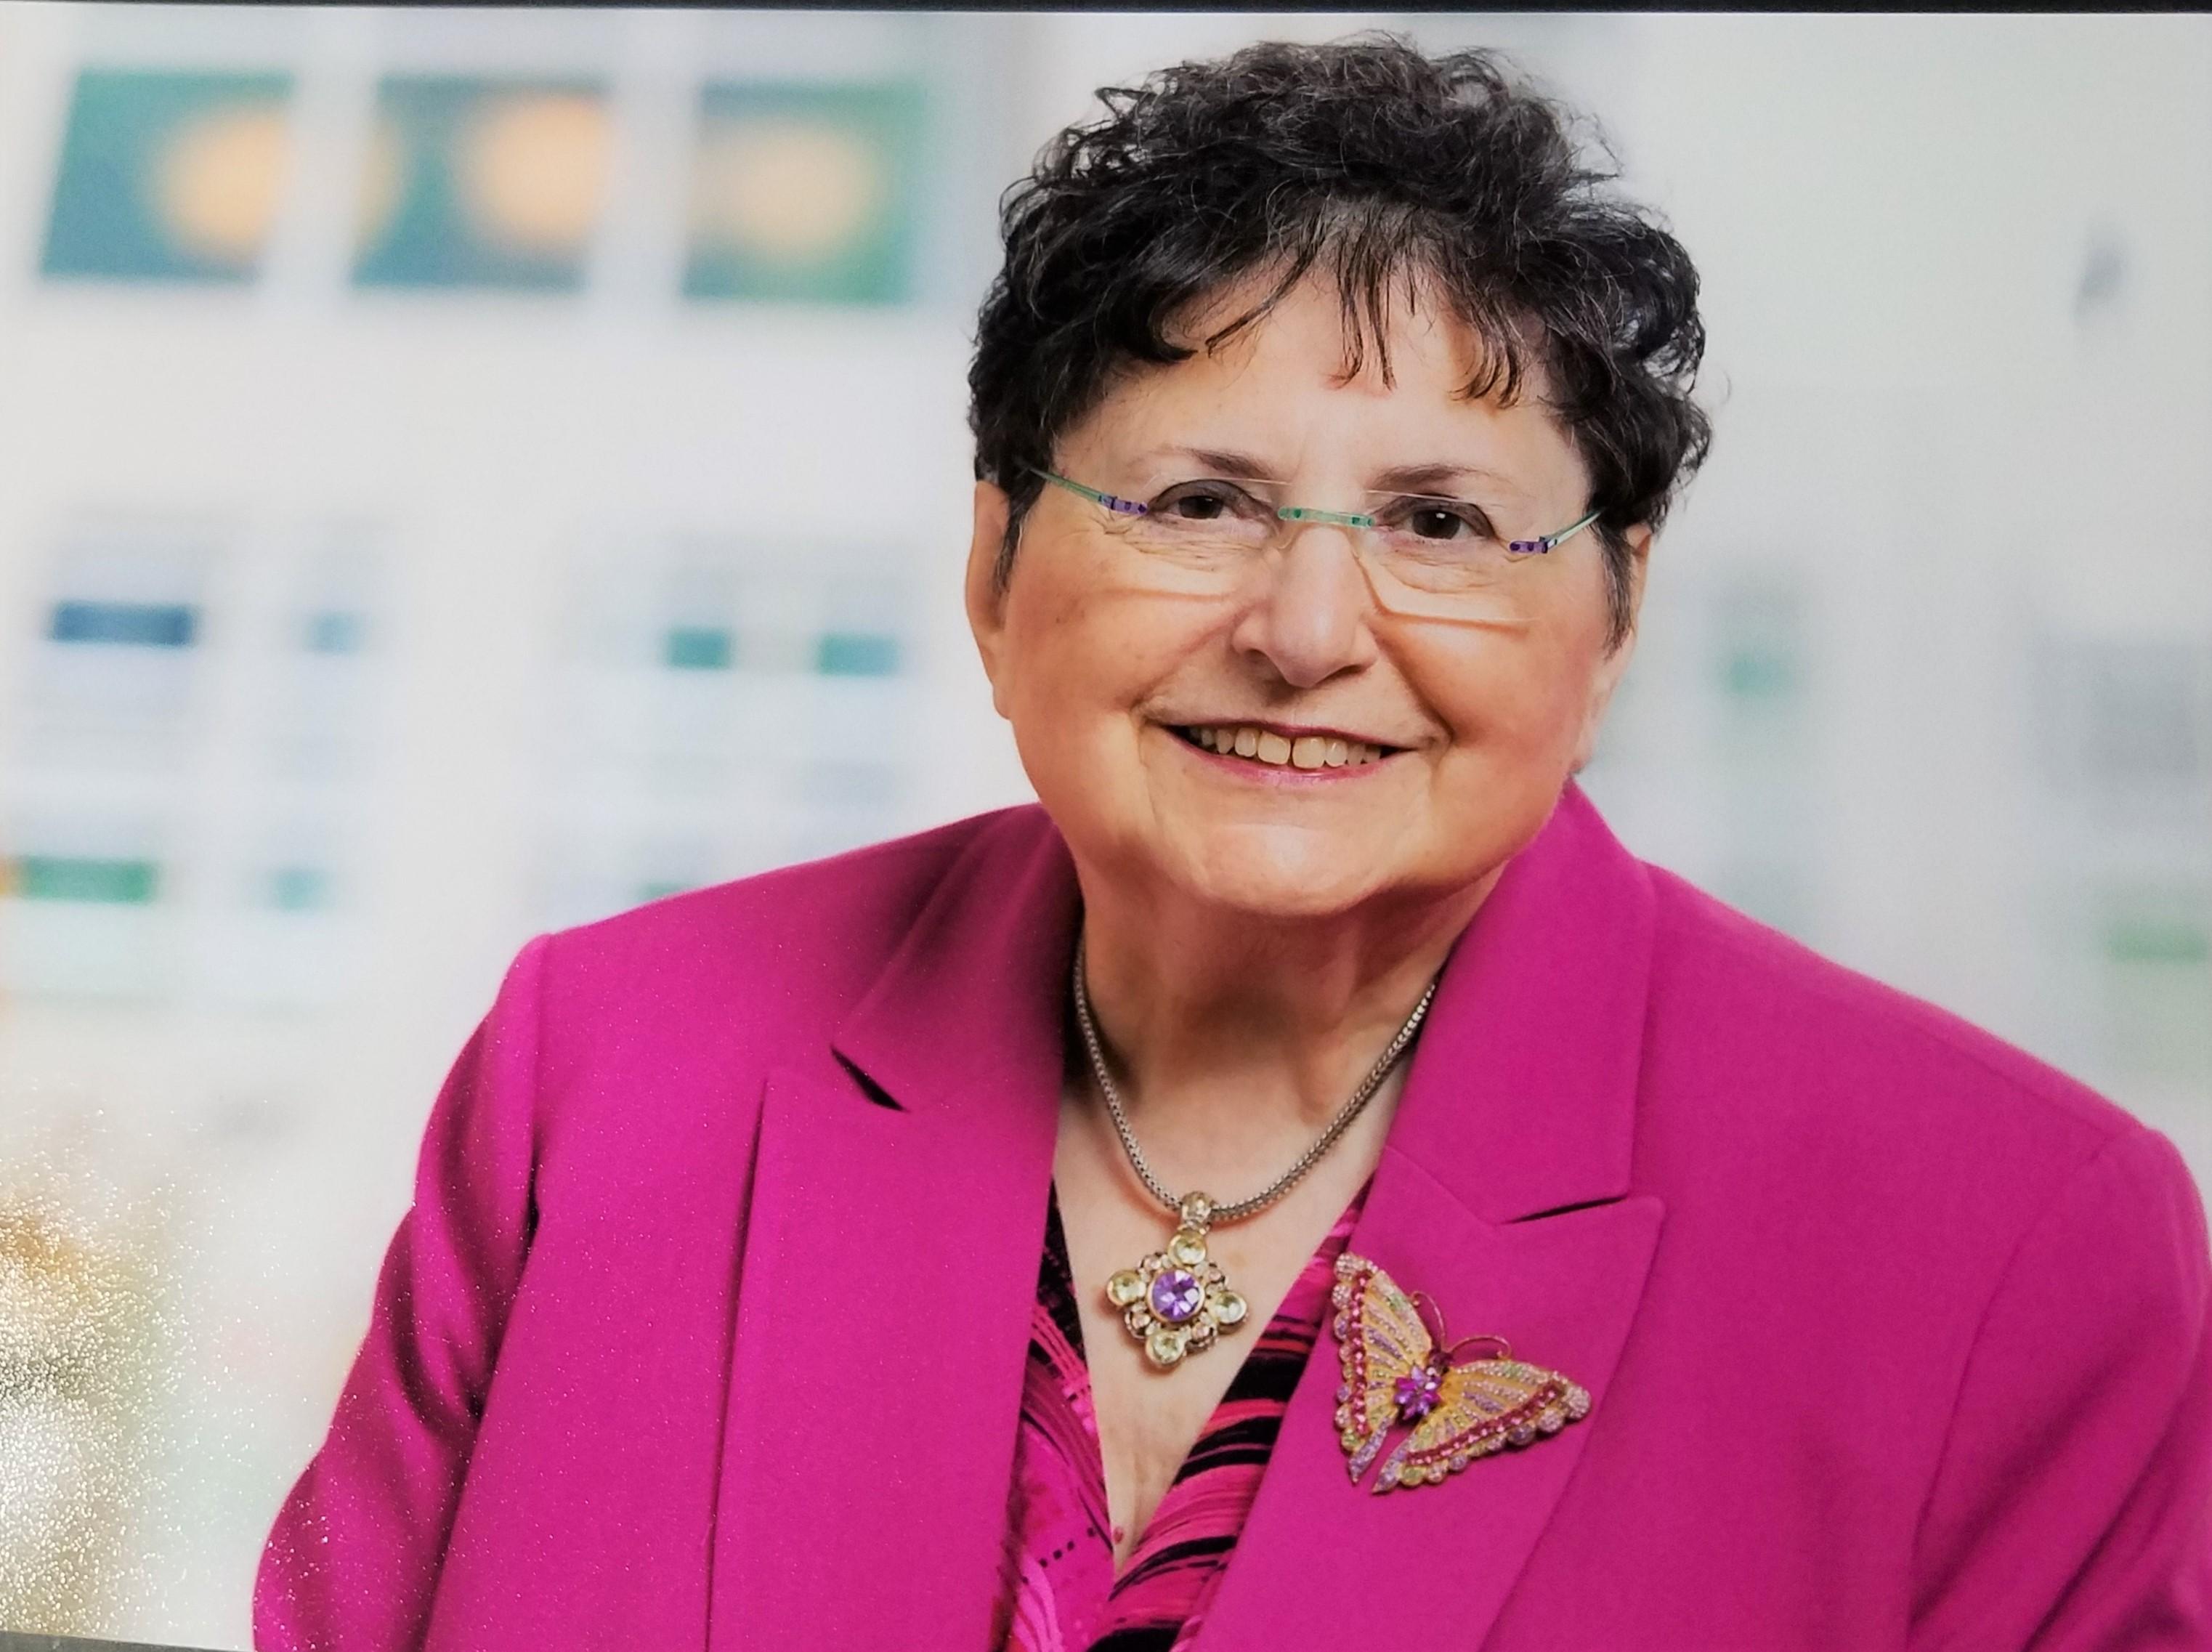 Dr. Elissa J. Santoro, MD